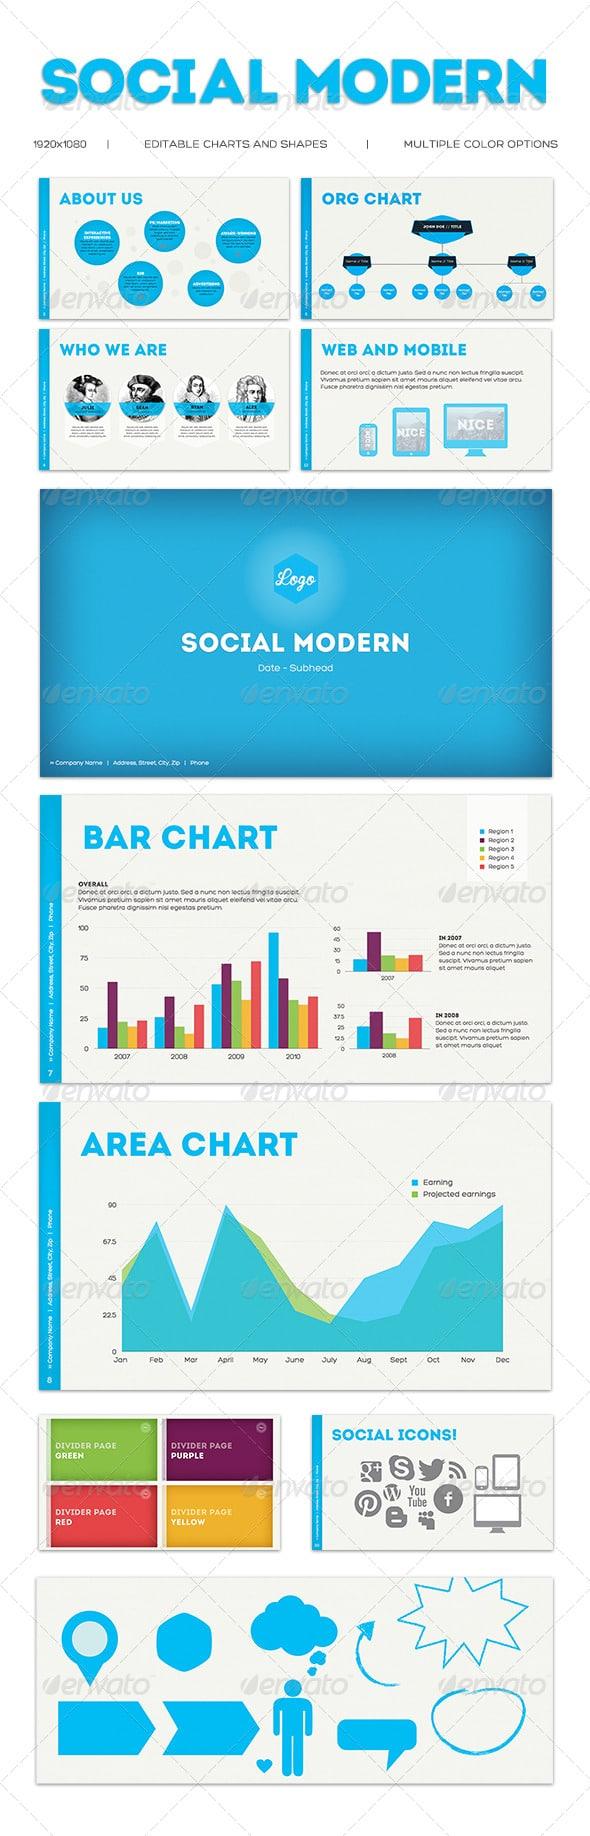 SocialModern-keynote-template